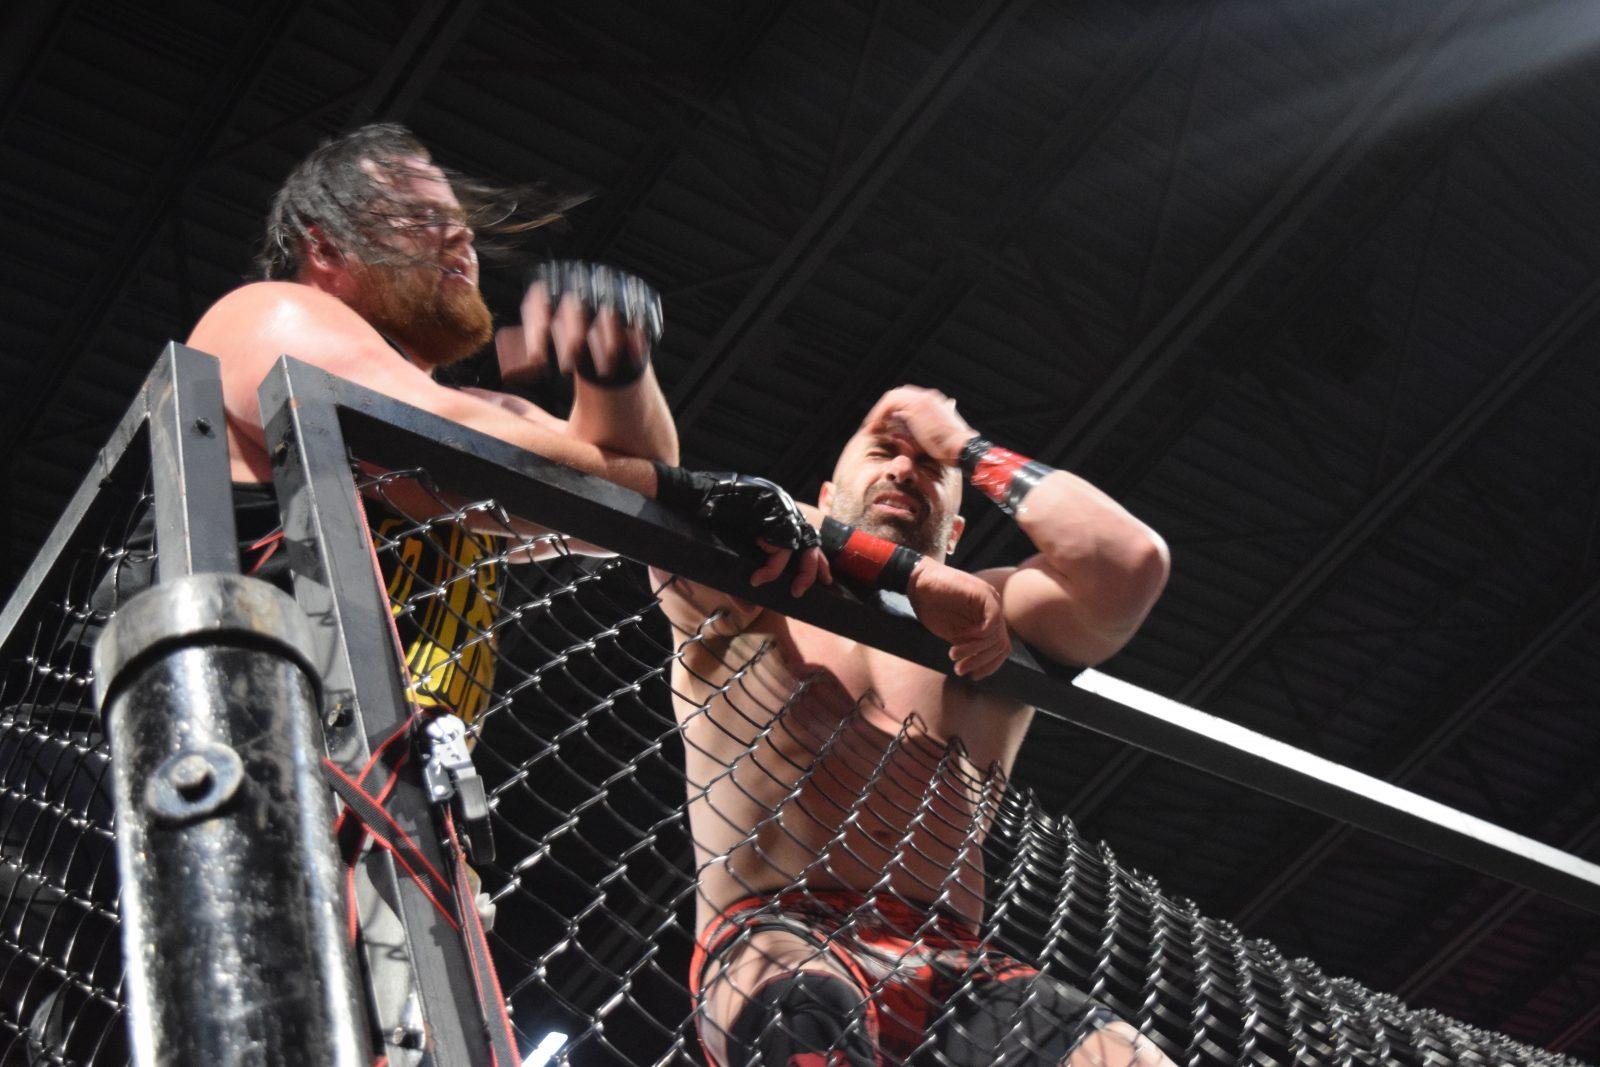 SLIDESHOW: SVW Superfight delivers